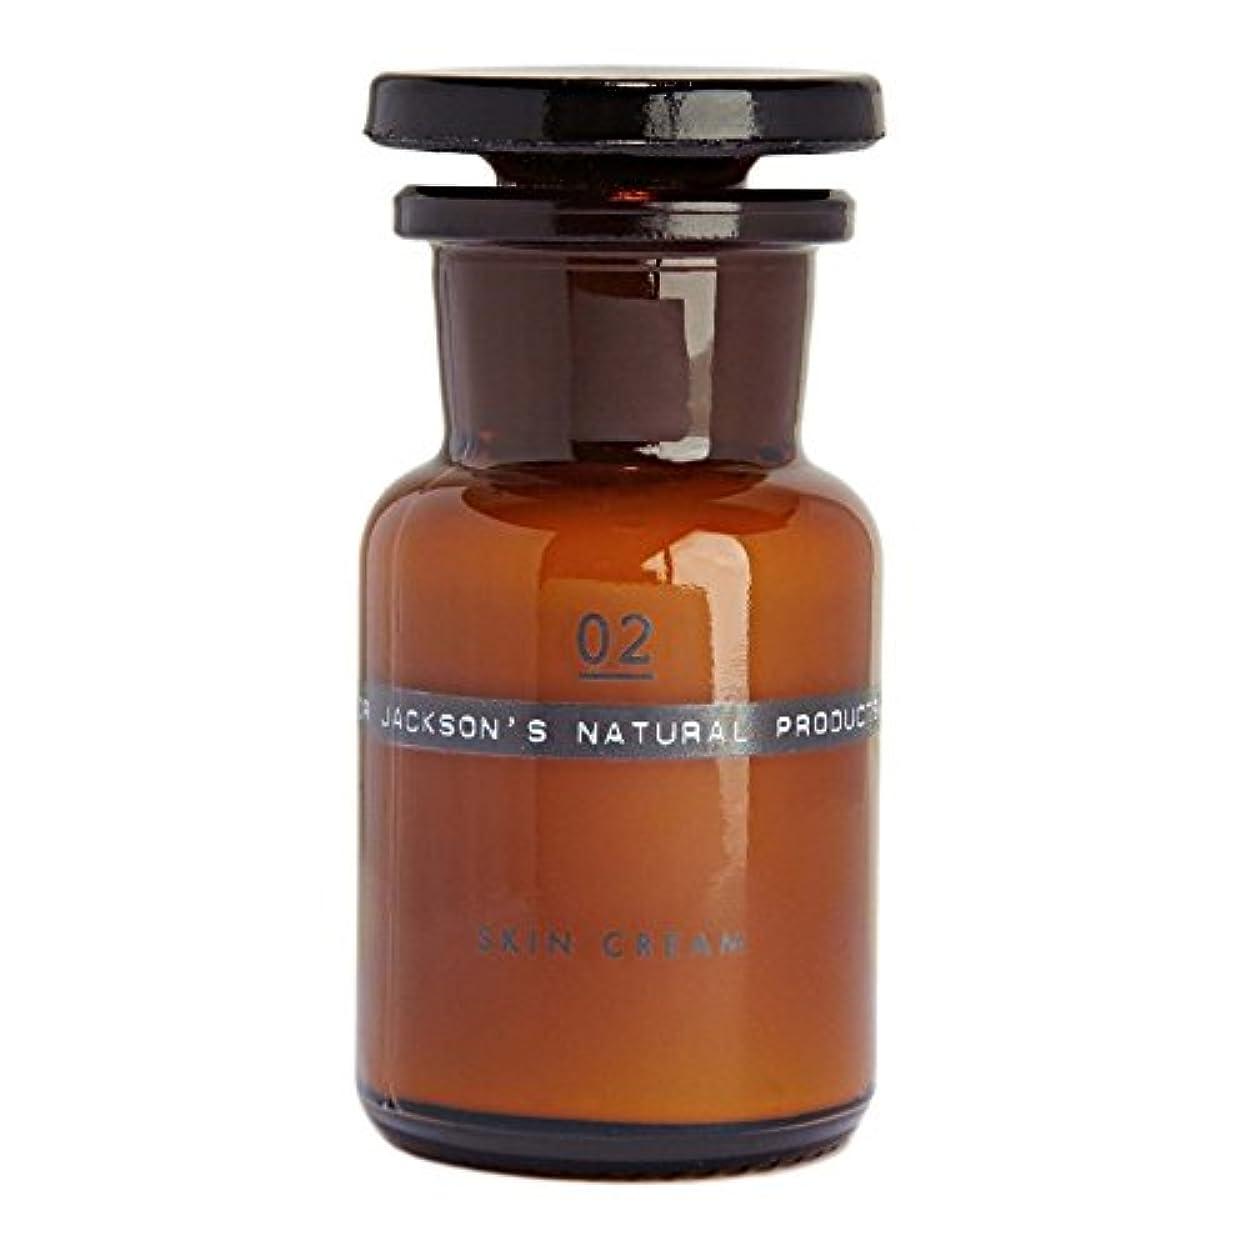 Dr Jackson's 02 Skin Cream 50ml - ジャクソンの02スキンクリーム50ミリリットル [並行輸入品]